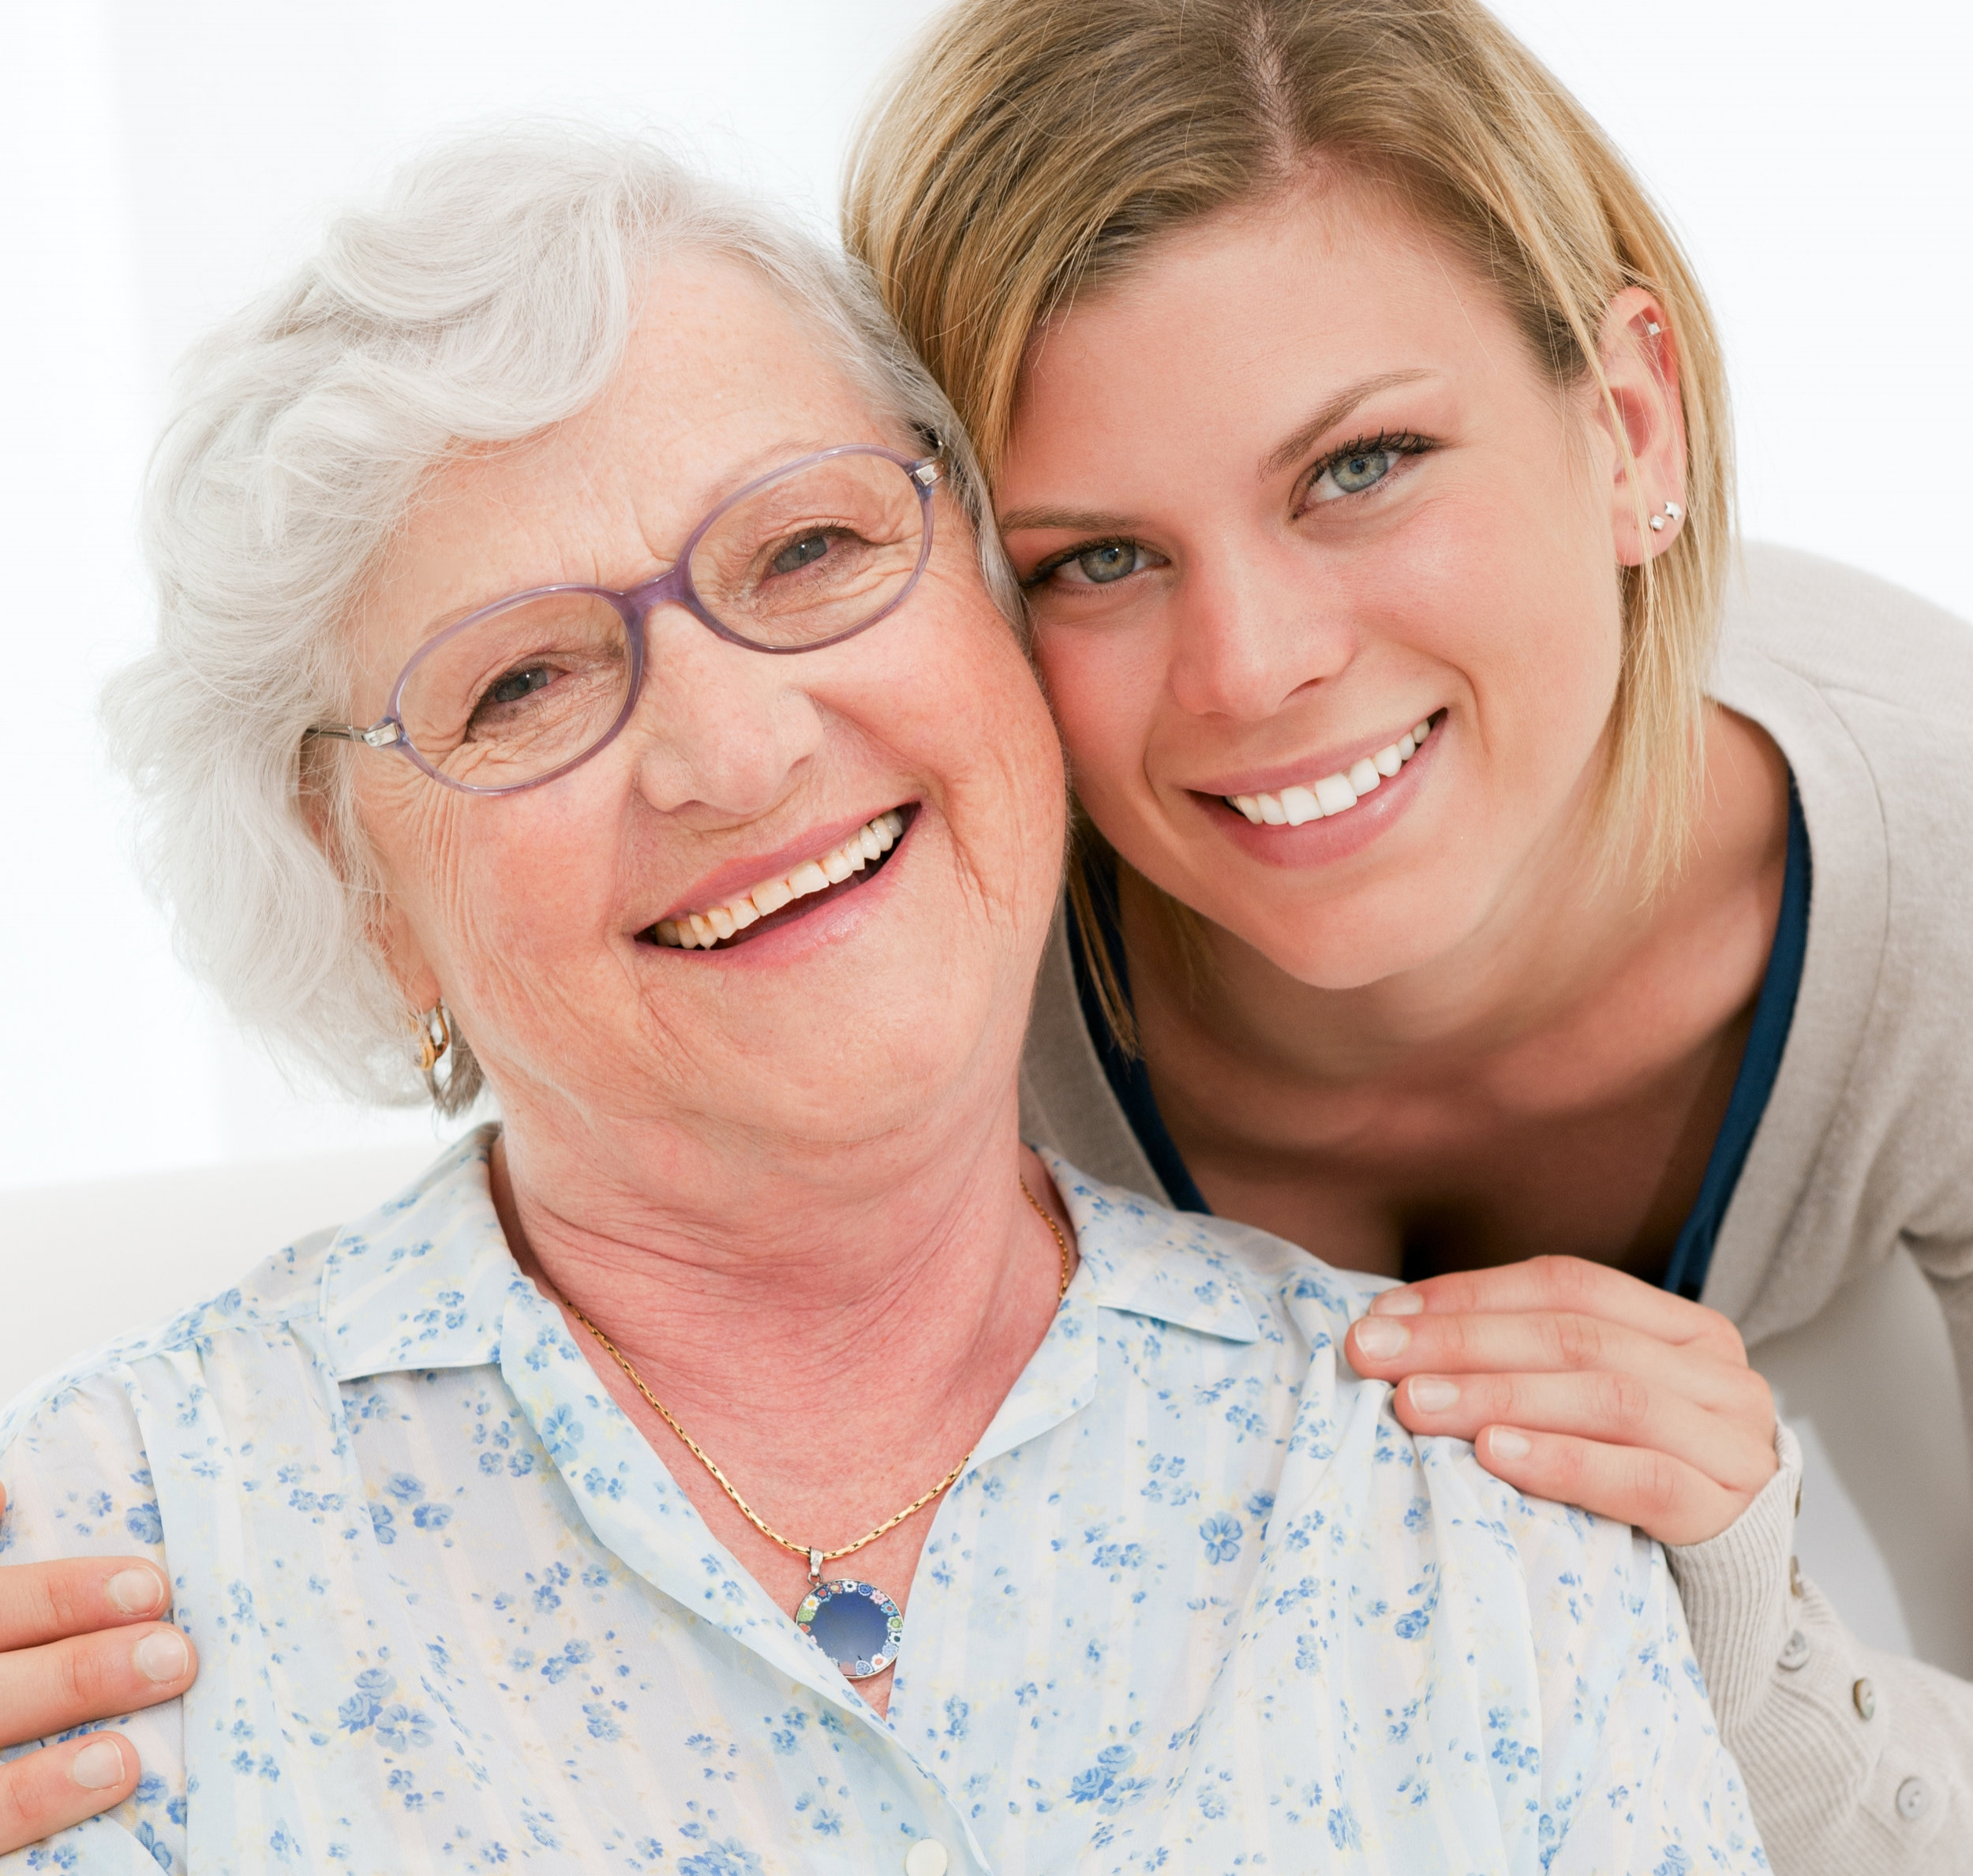 Two women smiling.